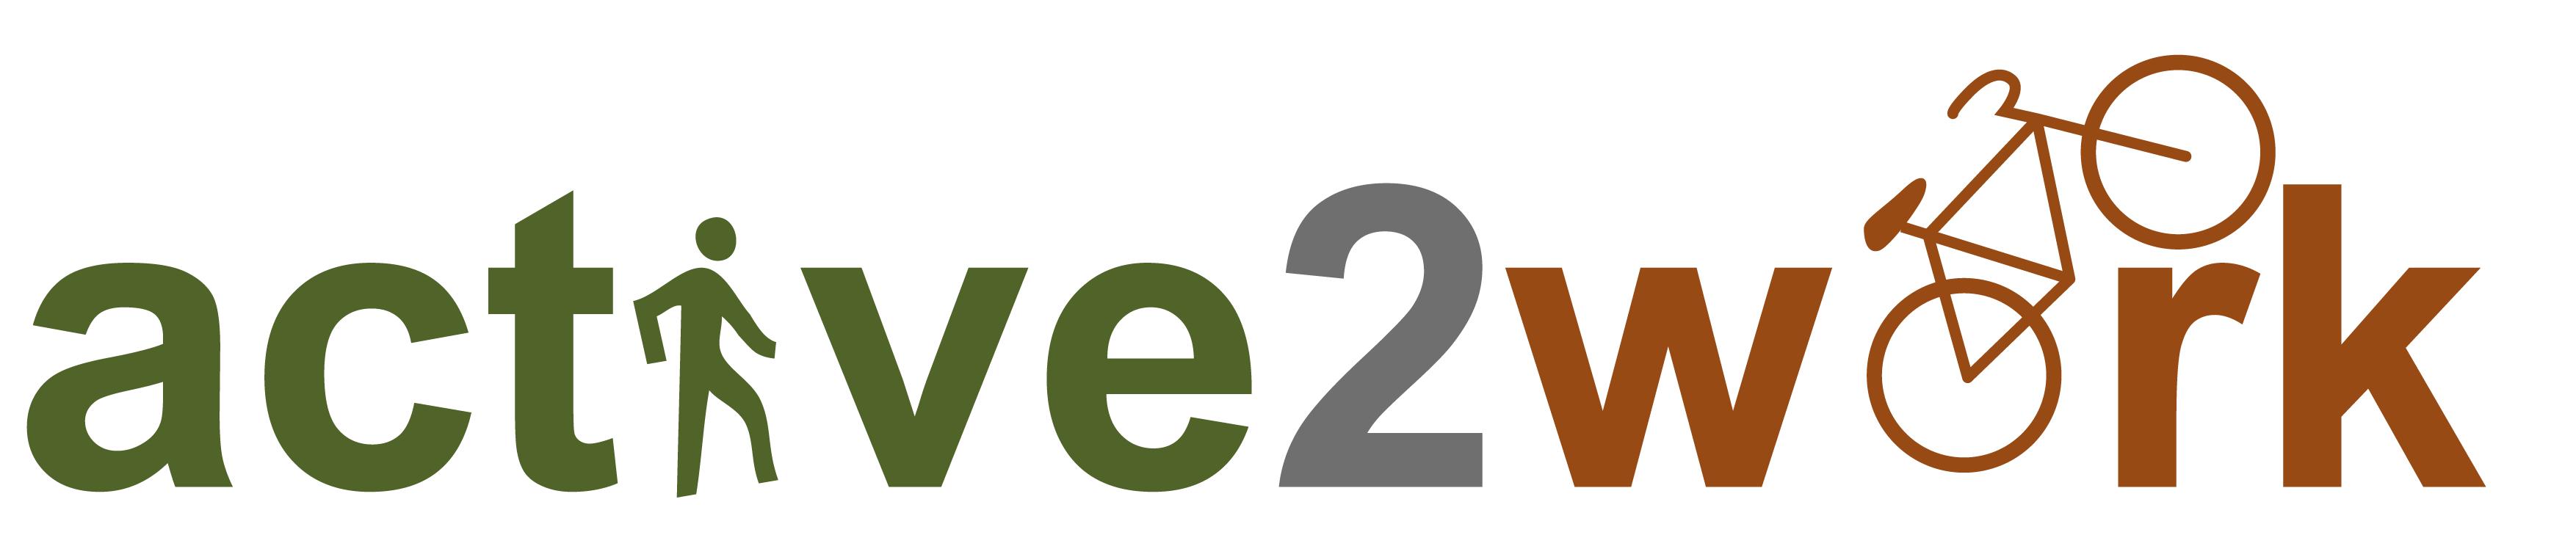 Active2work